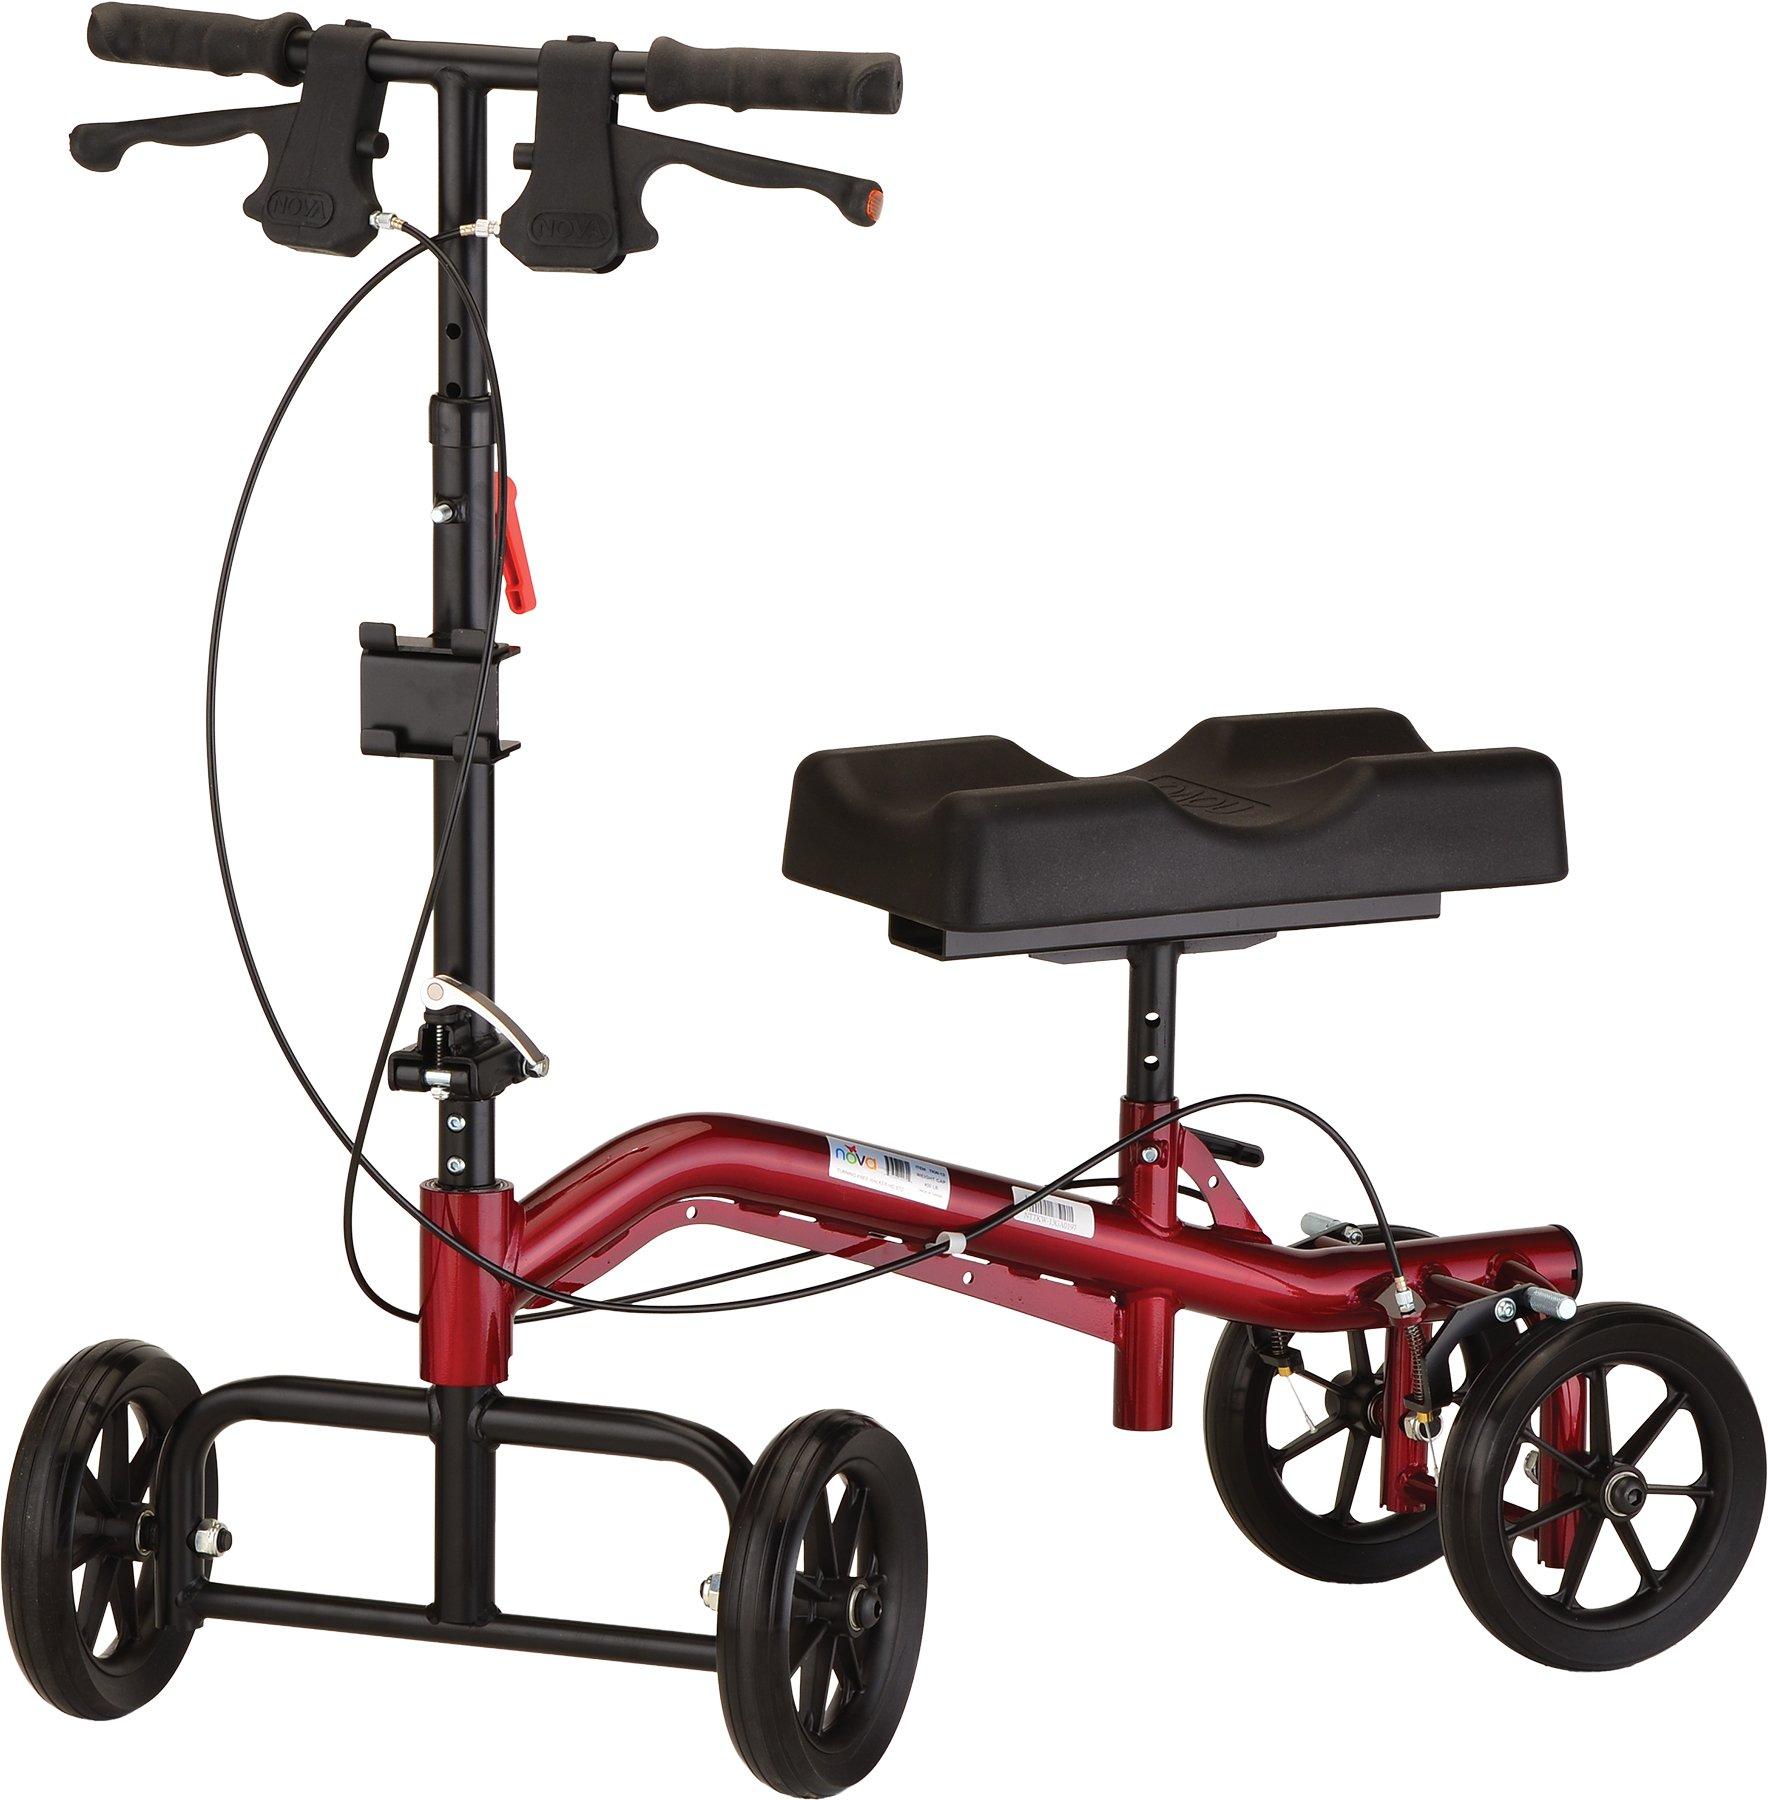 NOVA Medical Products Heavy Duty Knee Walker, Red